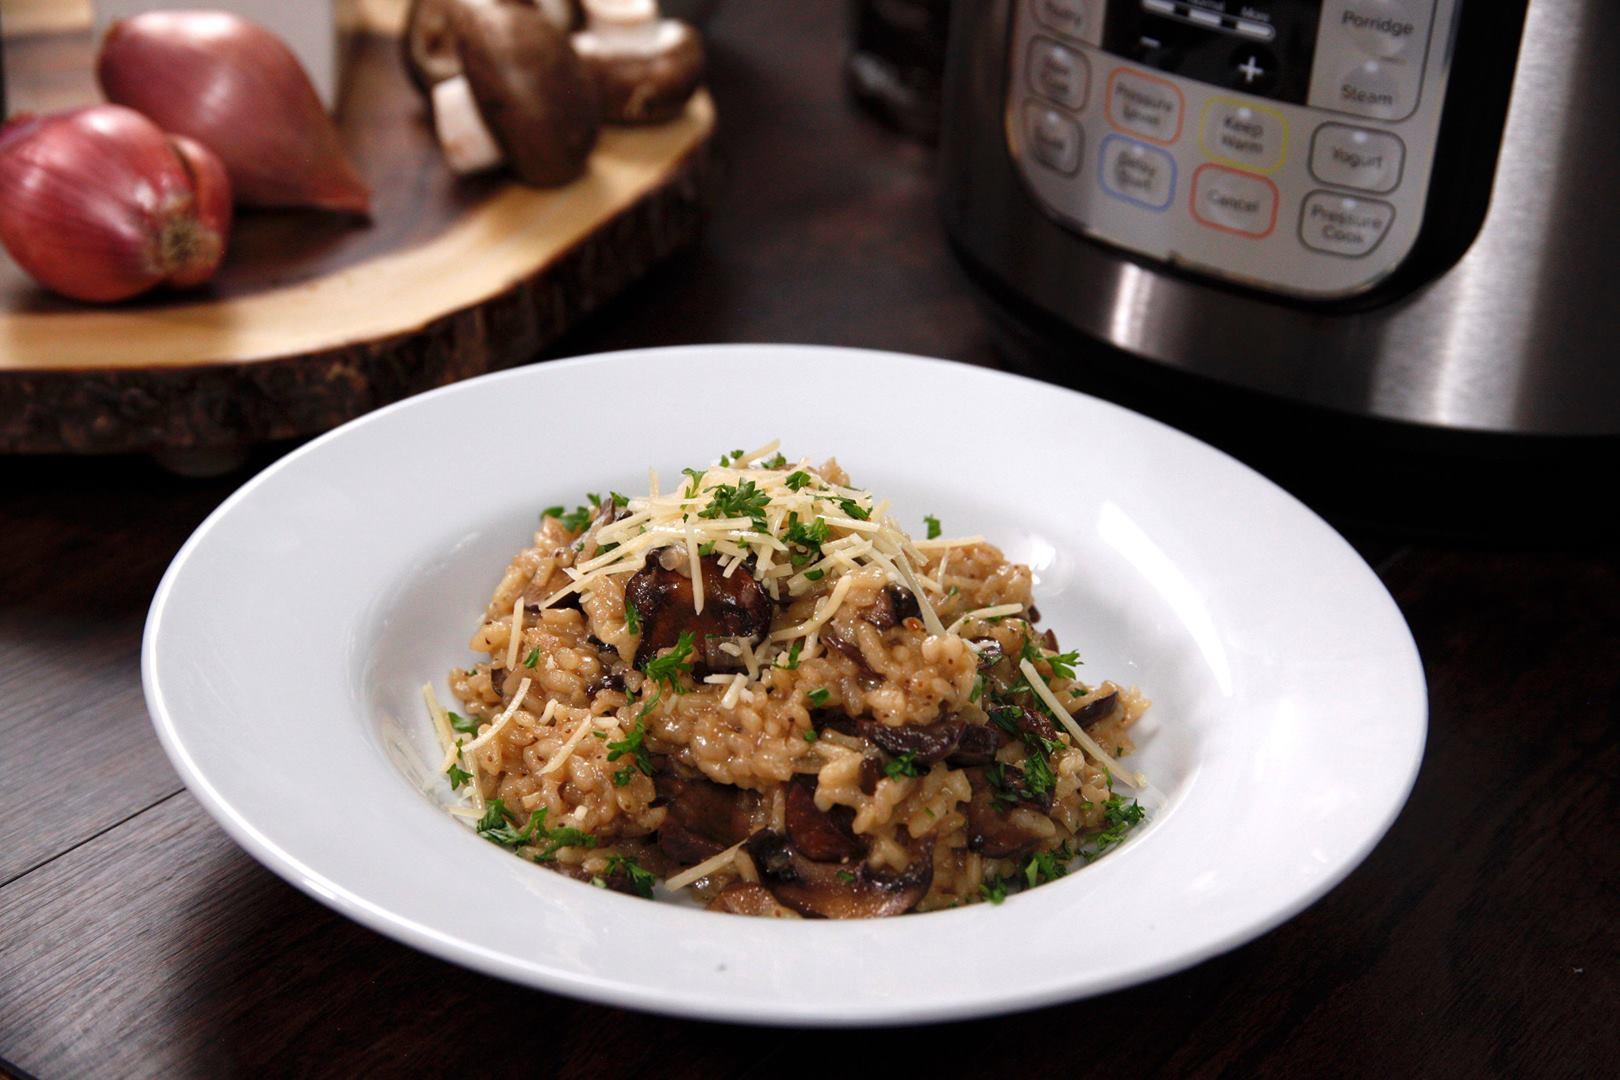 Instant Pot Balsamic Mushroom Risotto Cooking Tv Recipes